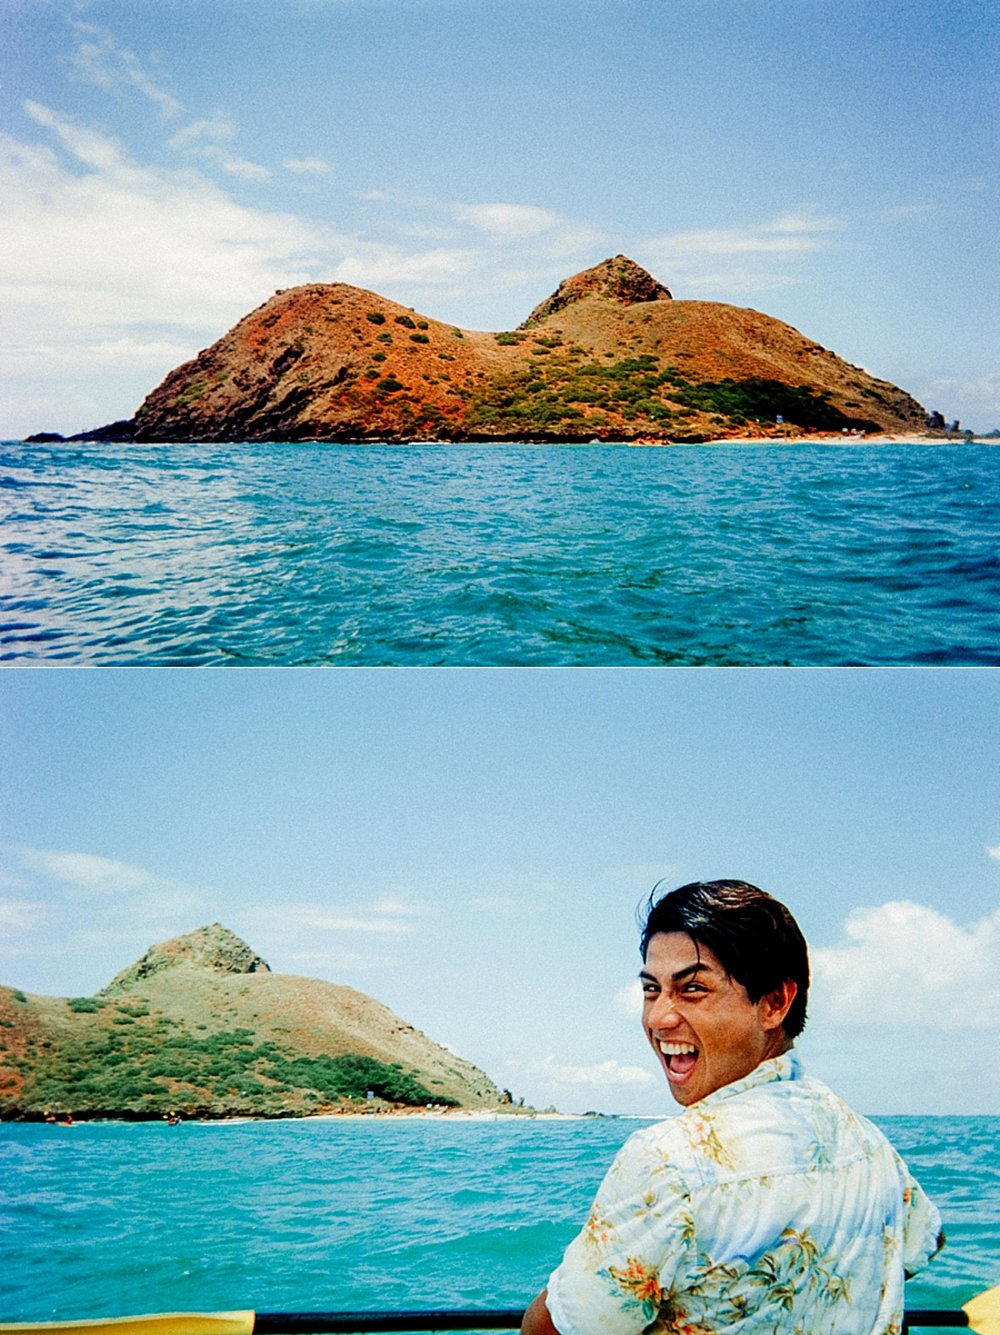 Adventurous-Oahu-Hawaii-Engagement-Proposal-Session-Photographer-Lanikai-Beach_0002.jpg